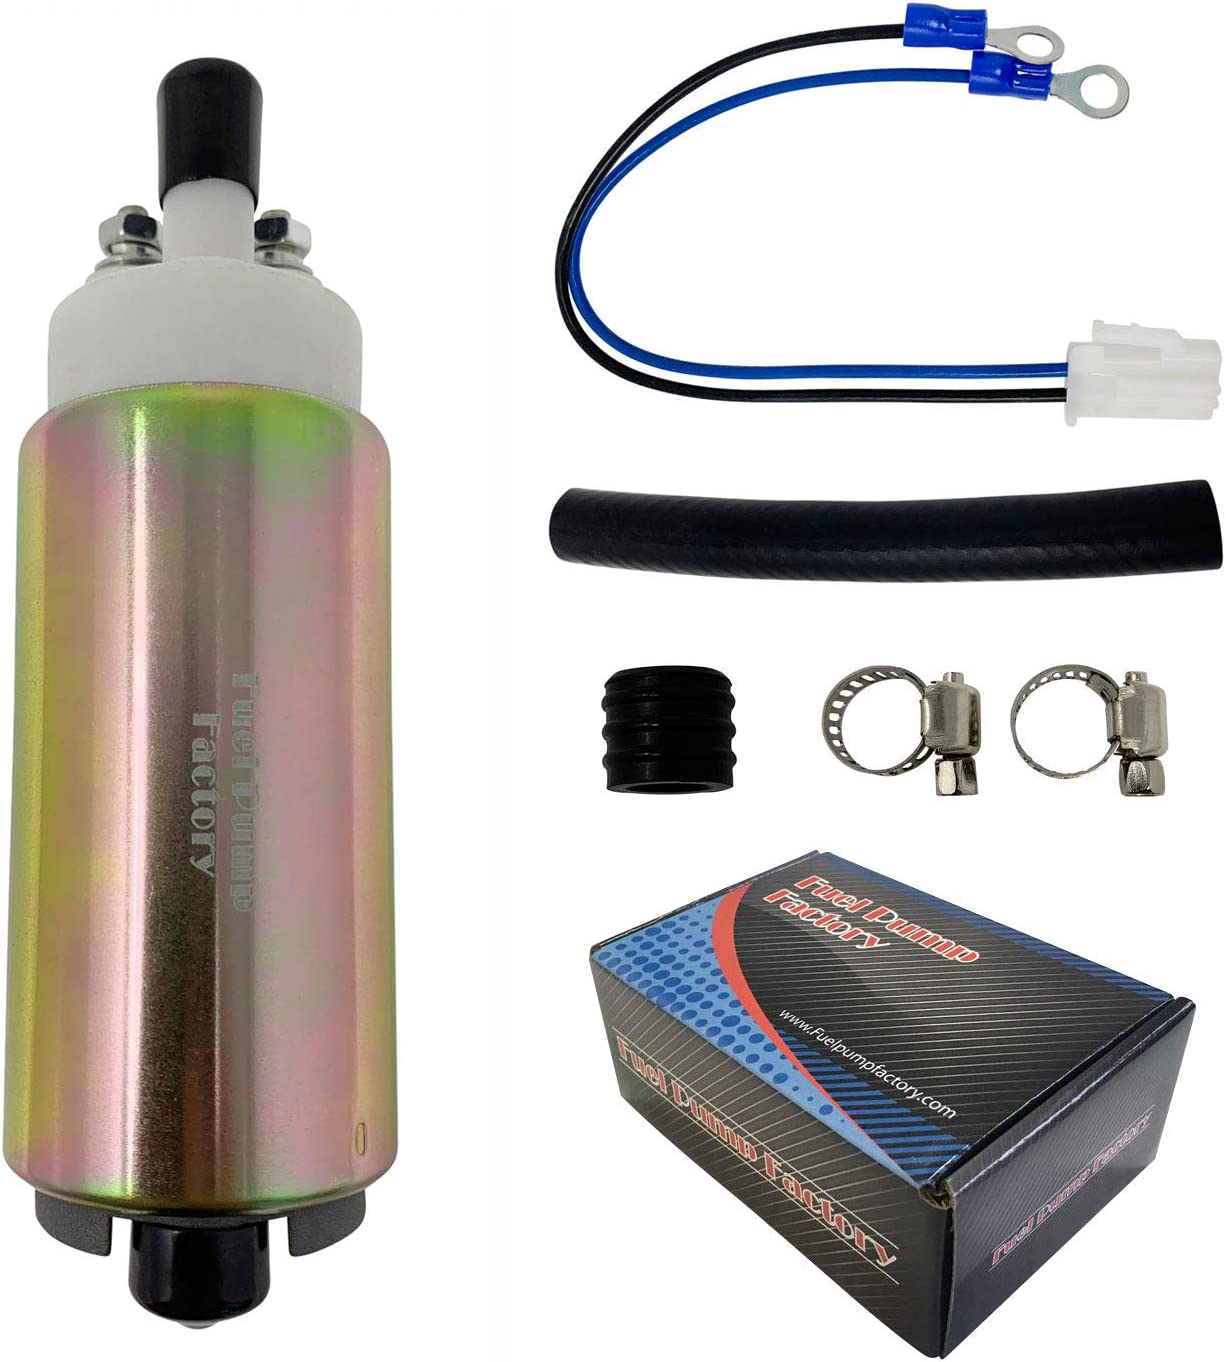 FPF Fuel Pump for Suzuki Outboard DF140 DF100 Super beauty Trust product restock quality top DF DF115 DF200